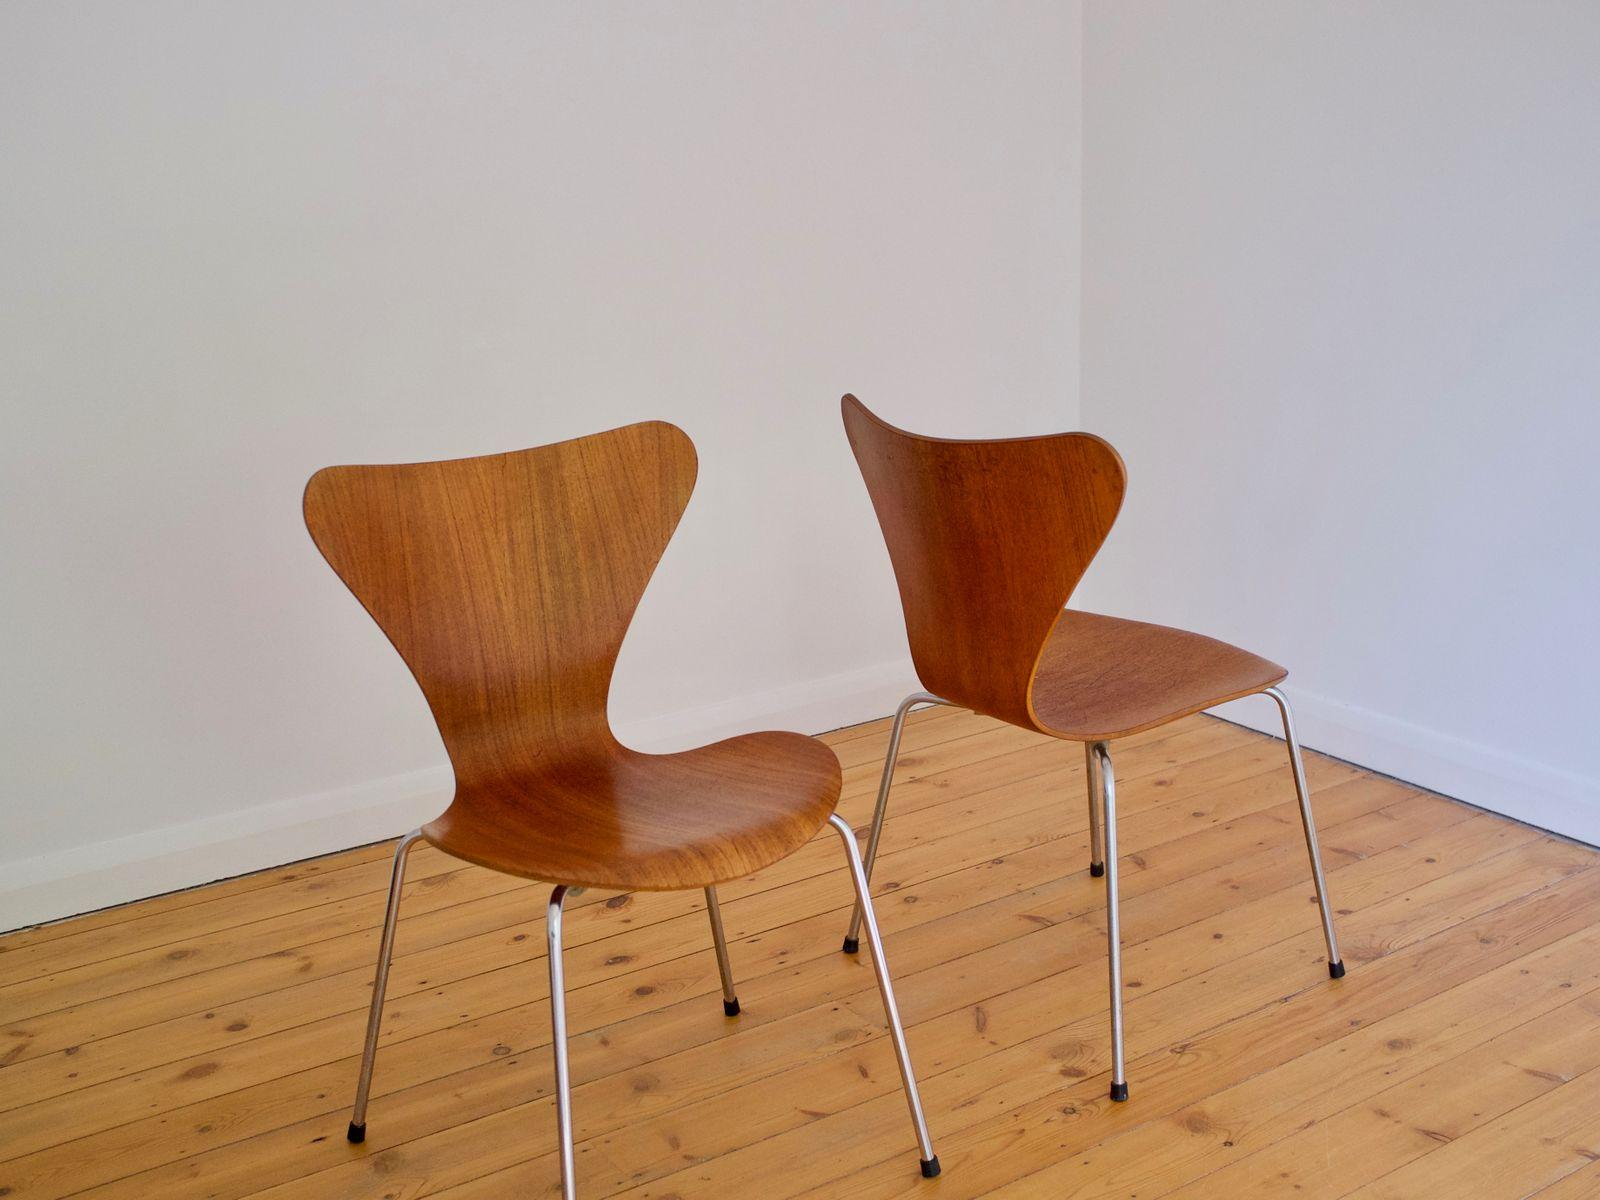 danish 3107 teak chair by arne jacobsen for fritz hansen. Black Bedroom Furniture Sets. Home Design Ideas